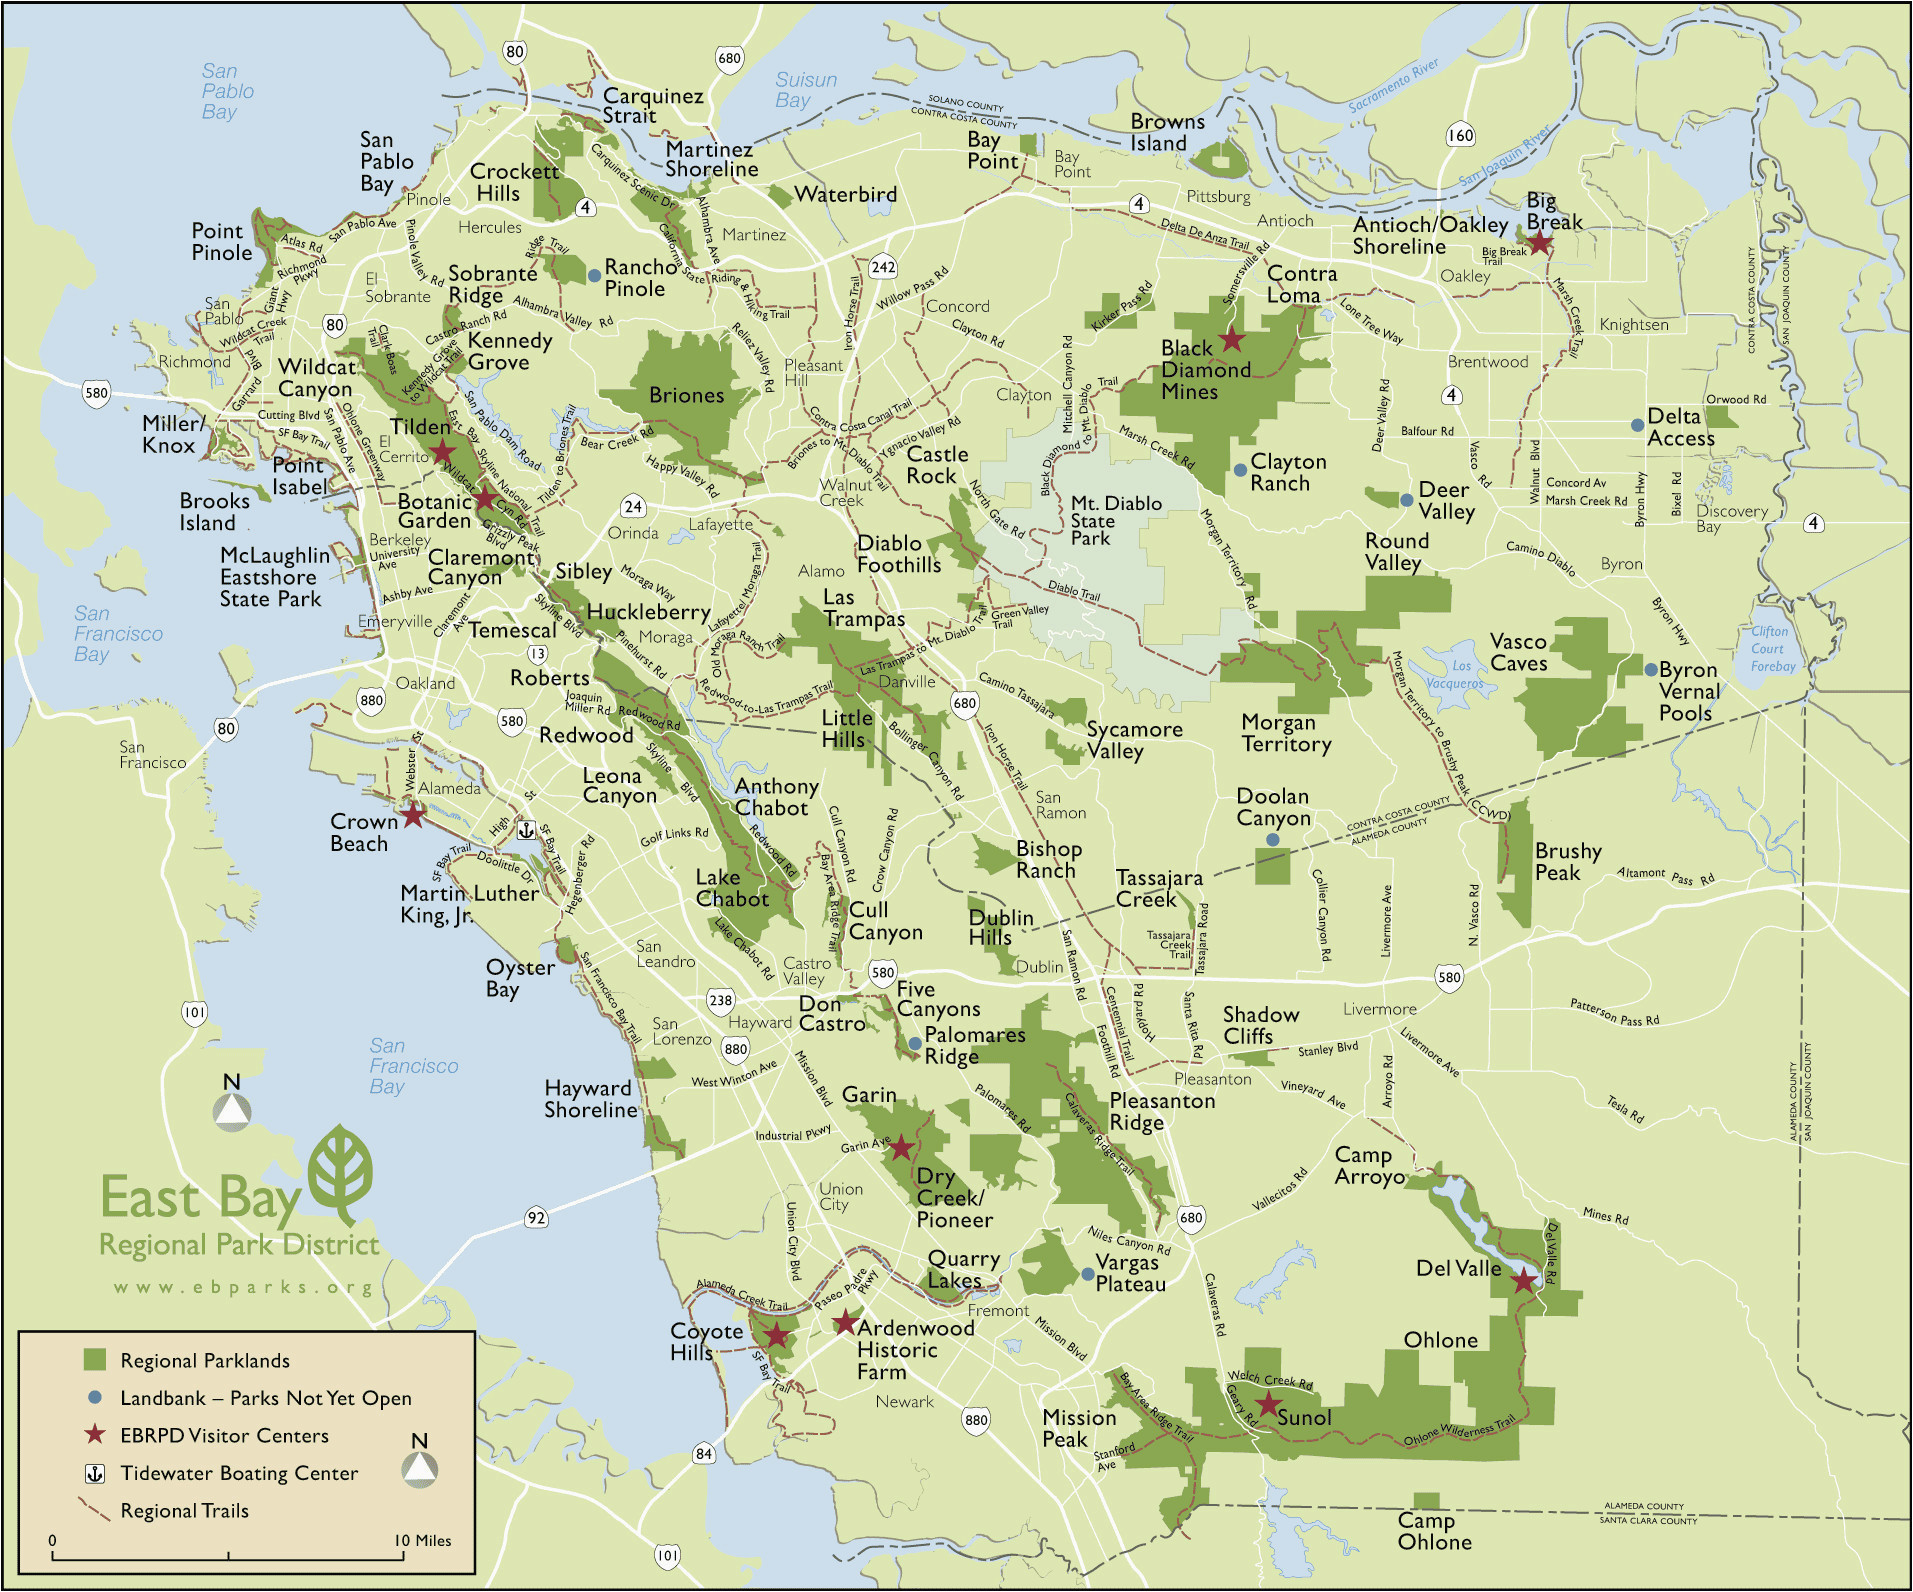 image regarding California Outline Printable called Blank Map Of California Printable Map San Francisco Bay Place